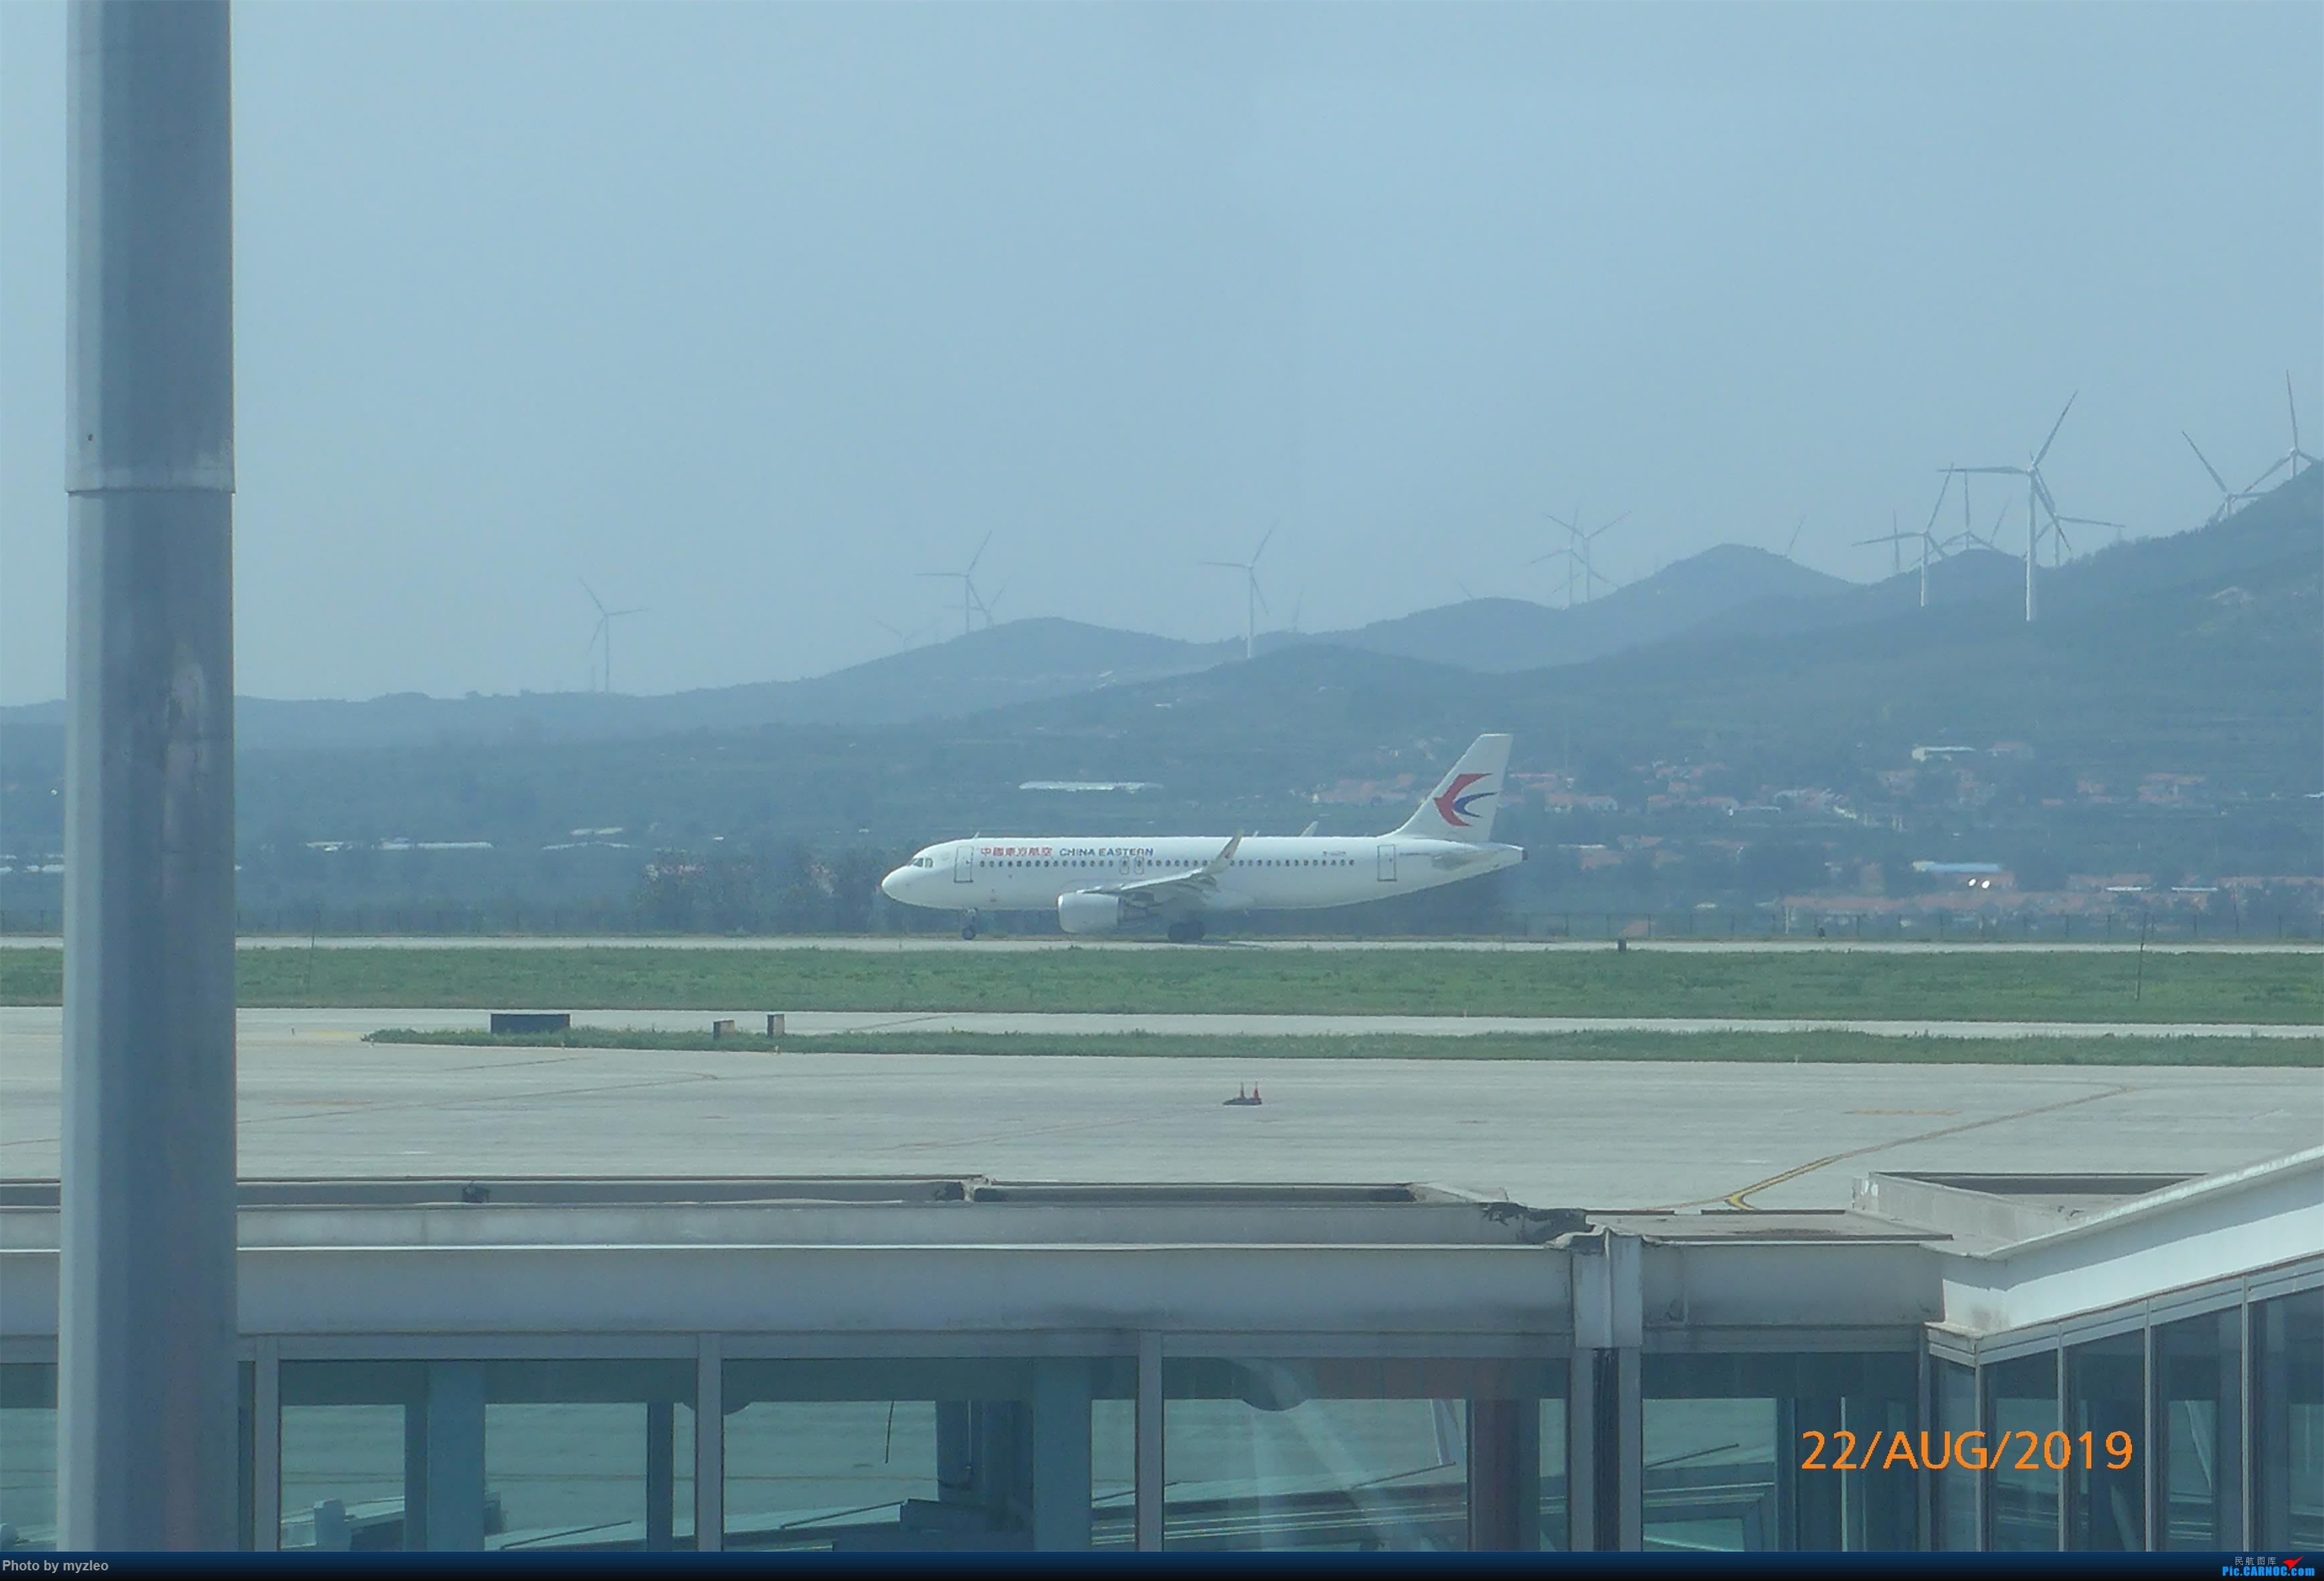 Re:[原创]【myzleo的游记5.2】梦圆一九(2)首访南苑把梦圆,初搭巴航连新缘 AIRBUS A320-200  中国烟台蓬莱国际机场